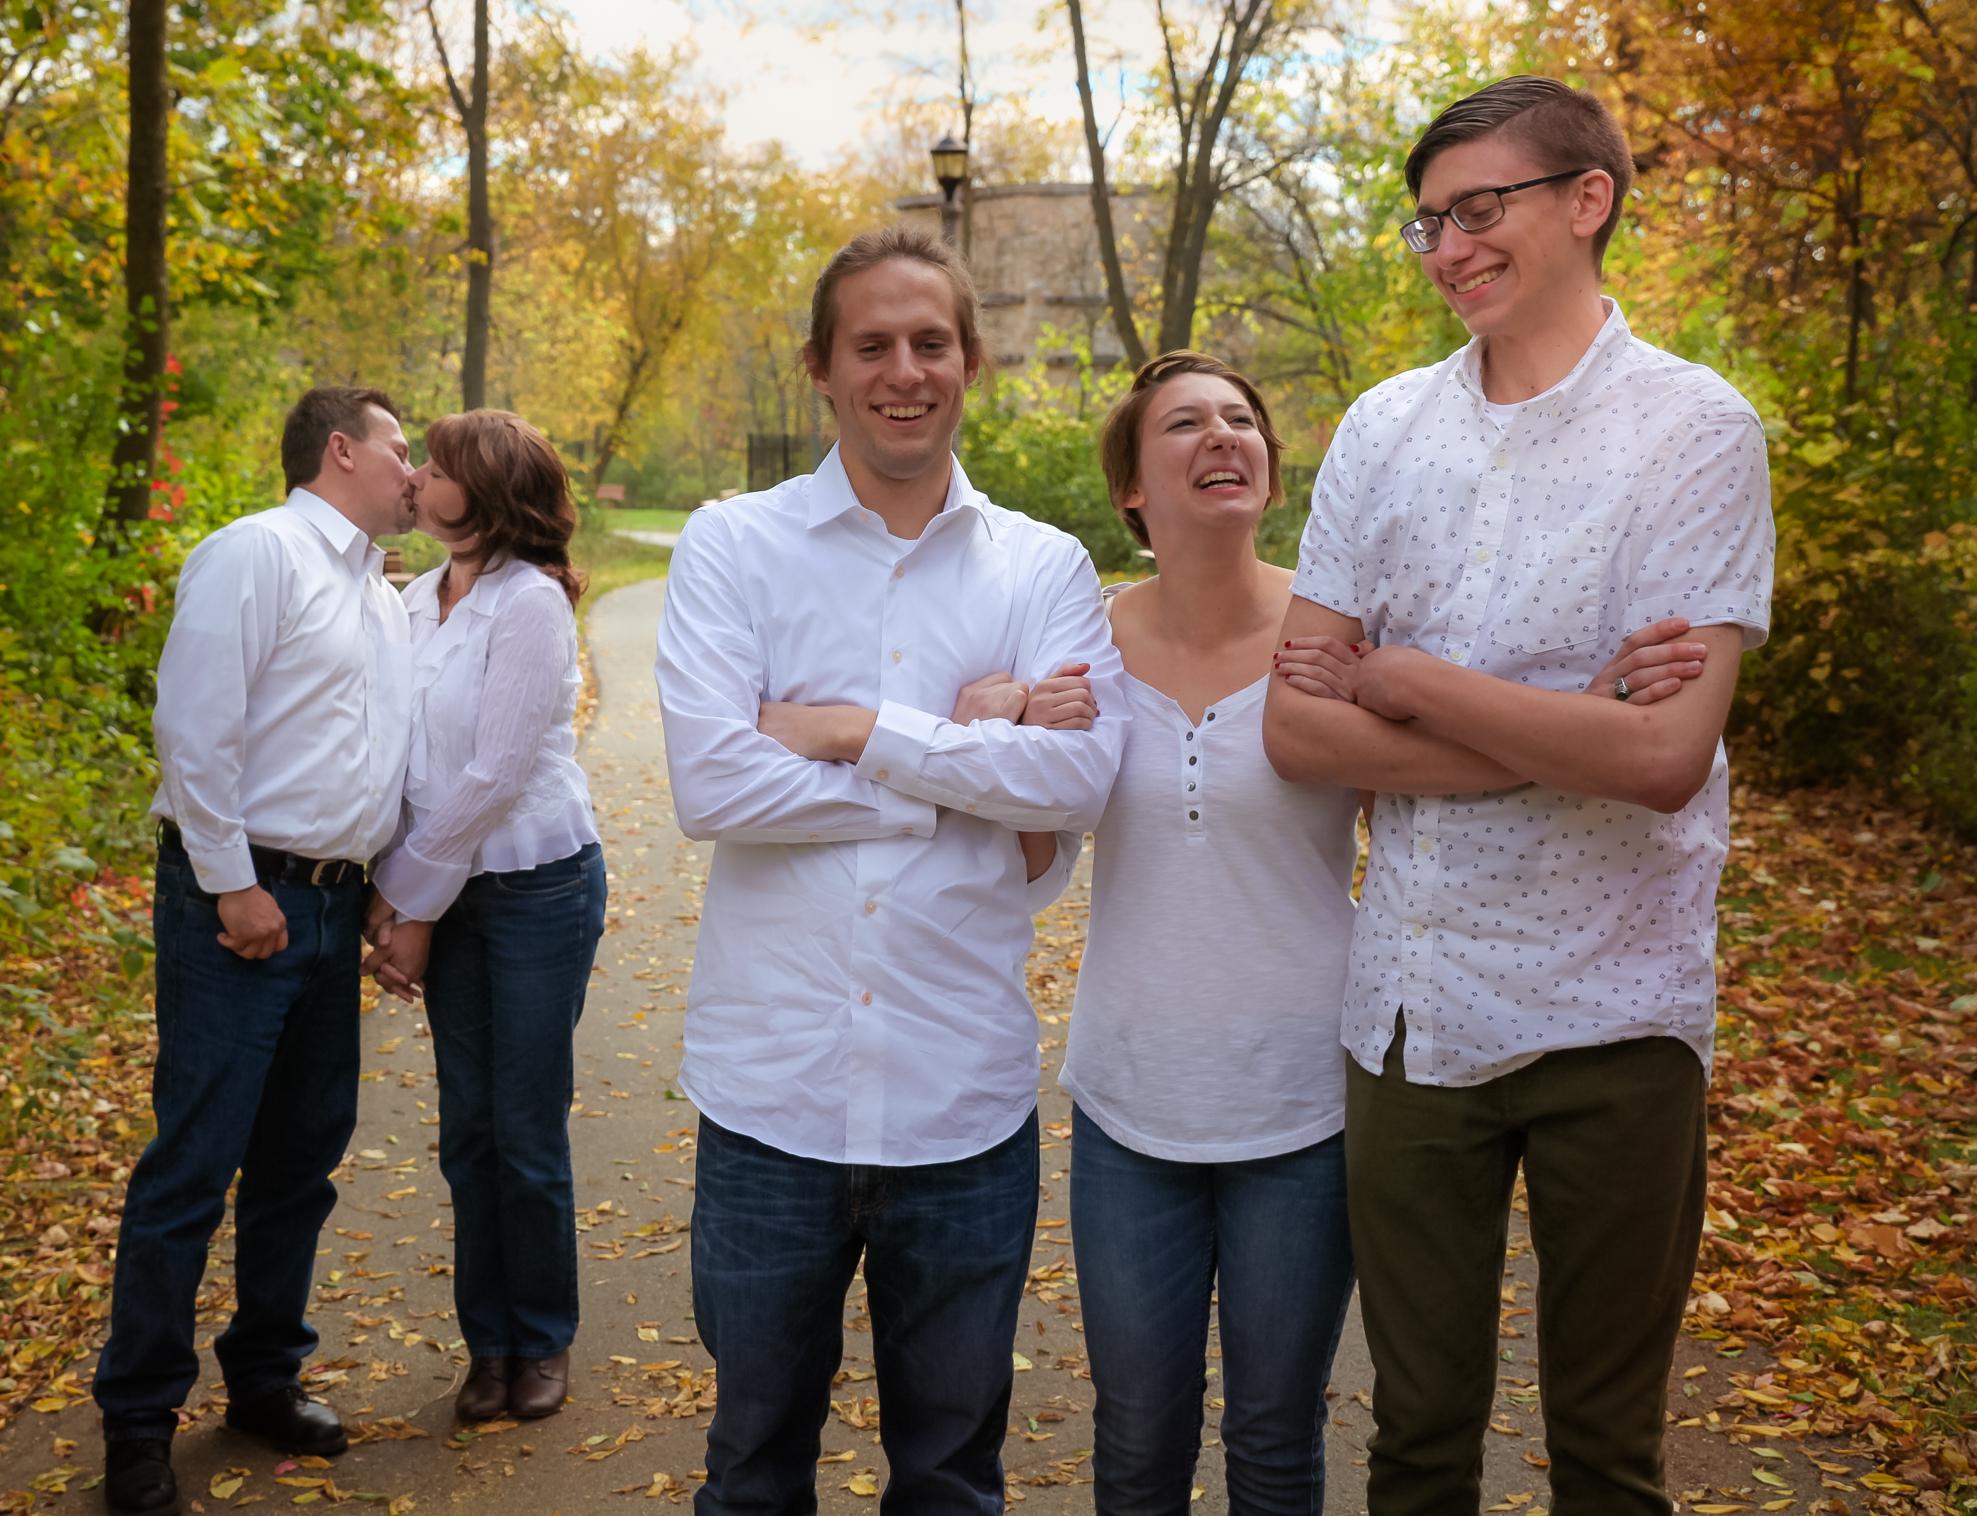 Pesch Family Portraits 2015 (24 of 83).jpg